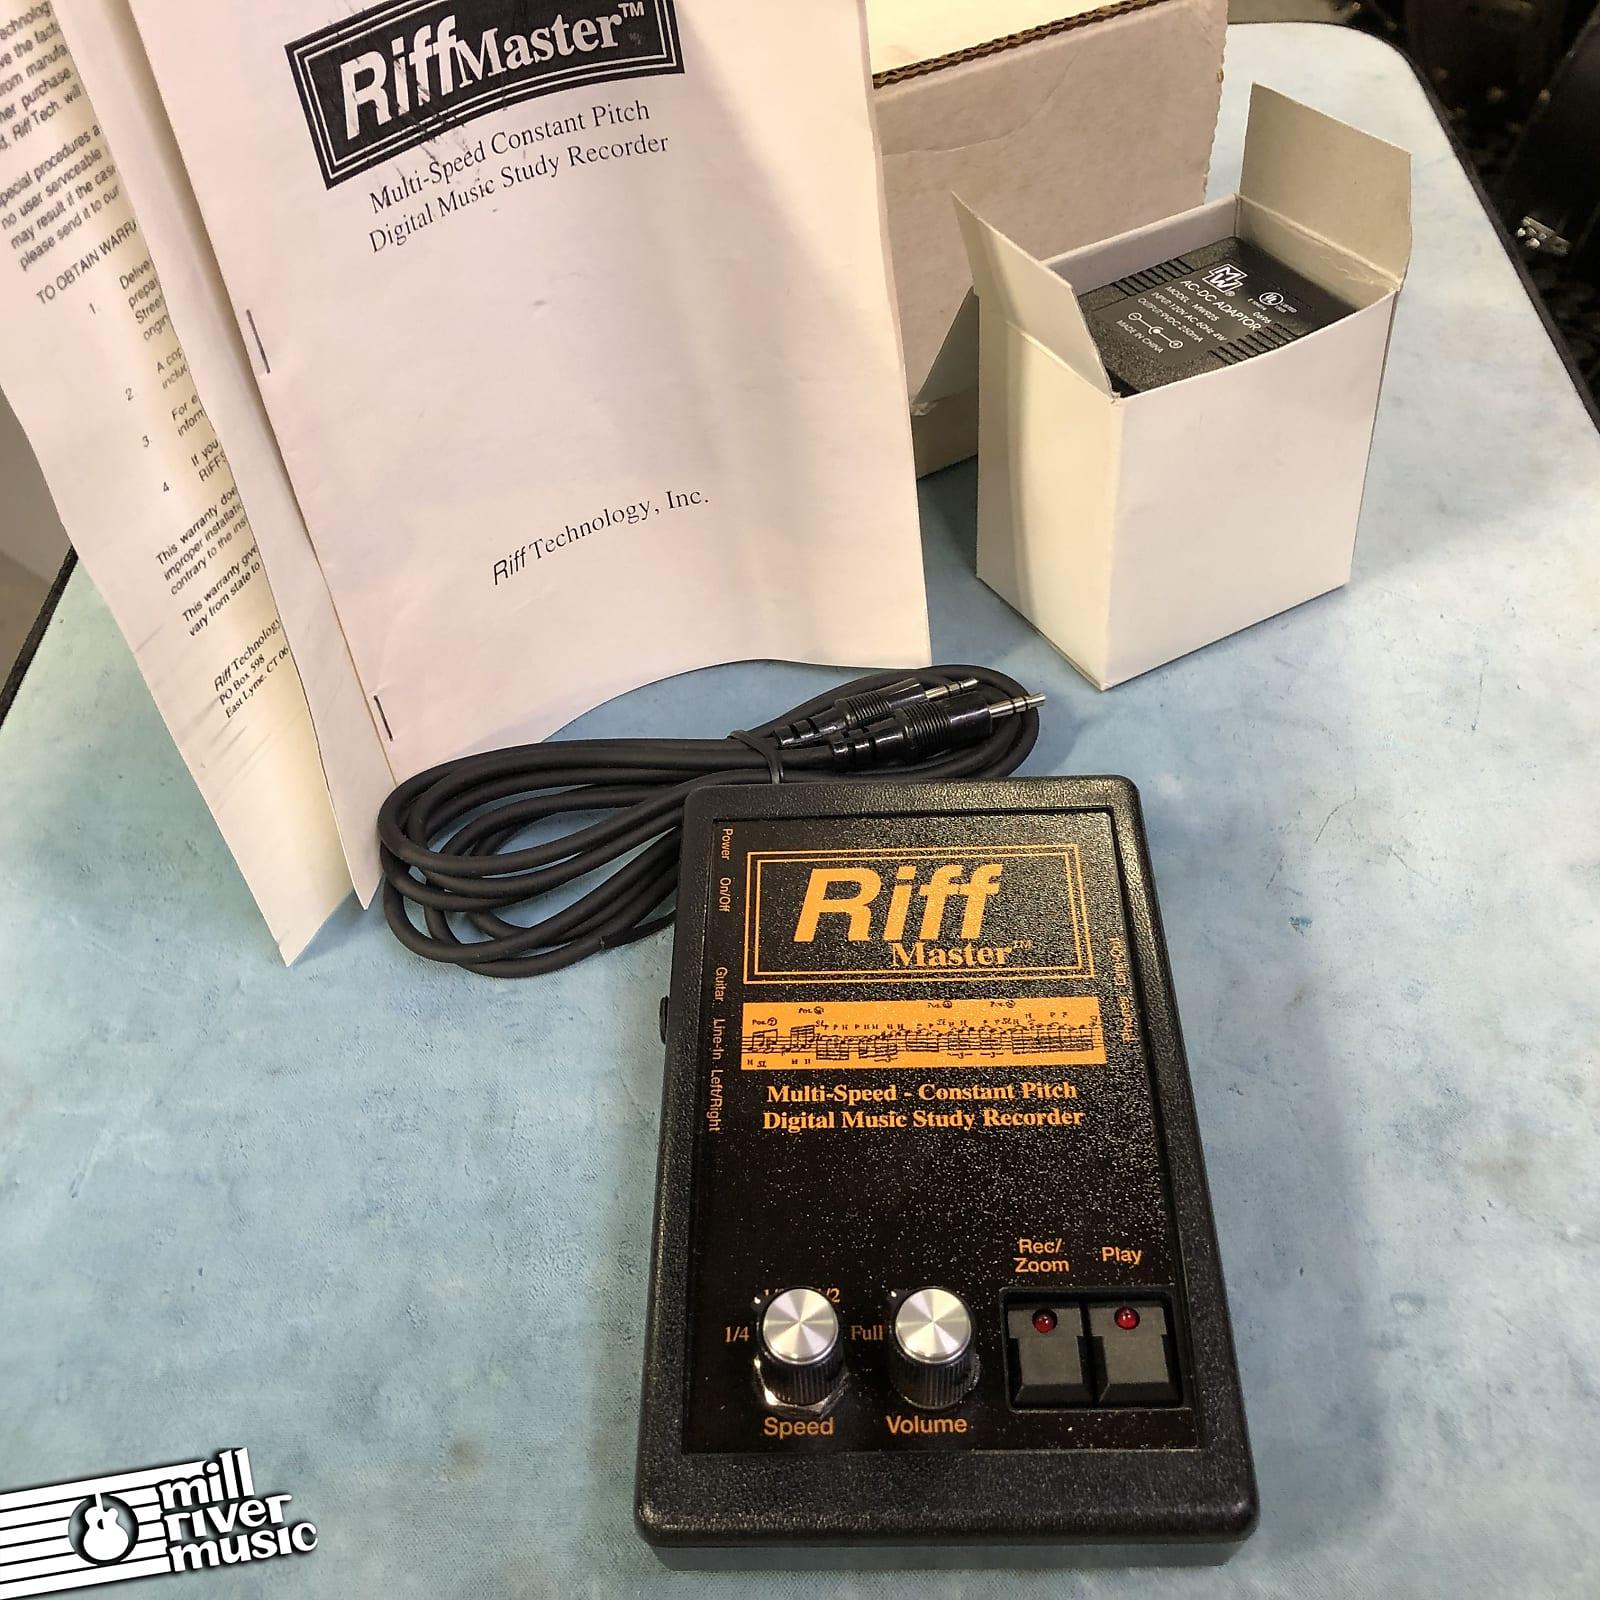 Riff Master Digital Music Study Recorder w/ Box & Power Supply